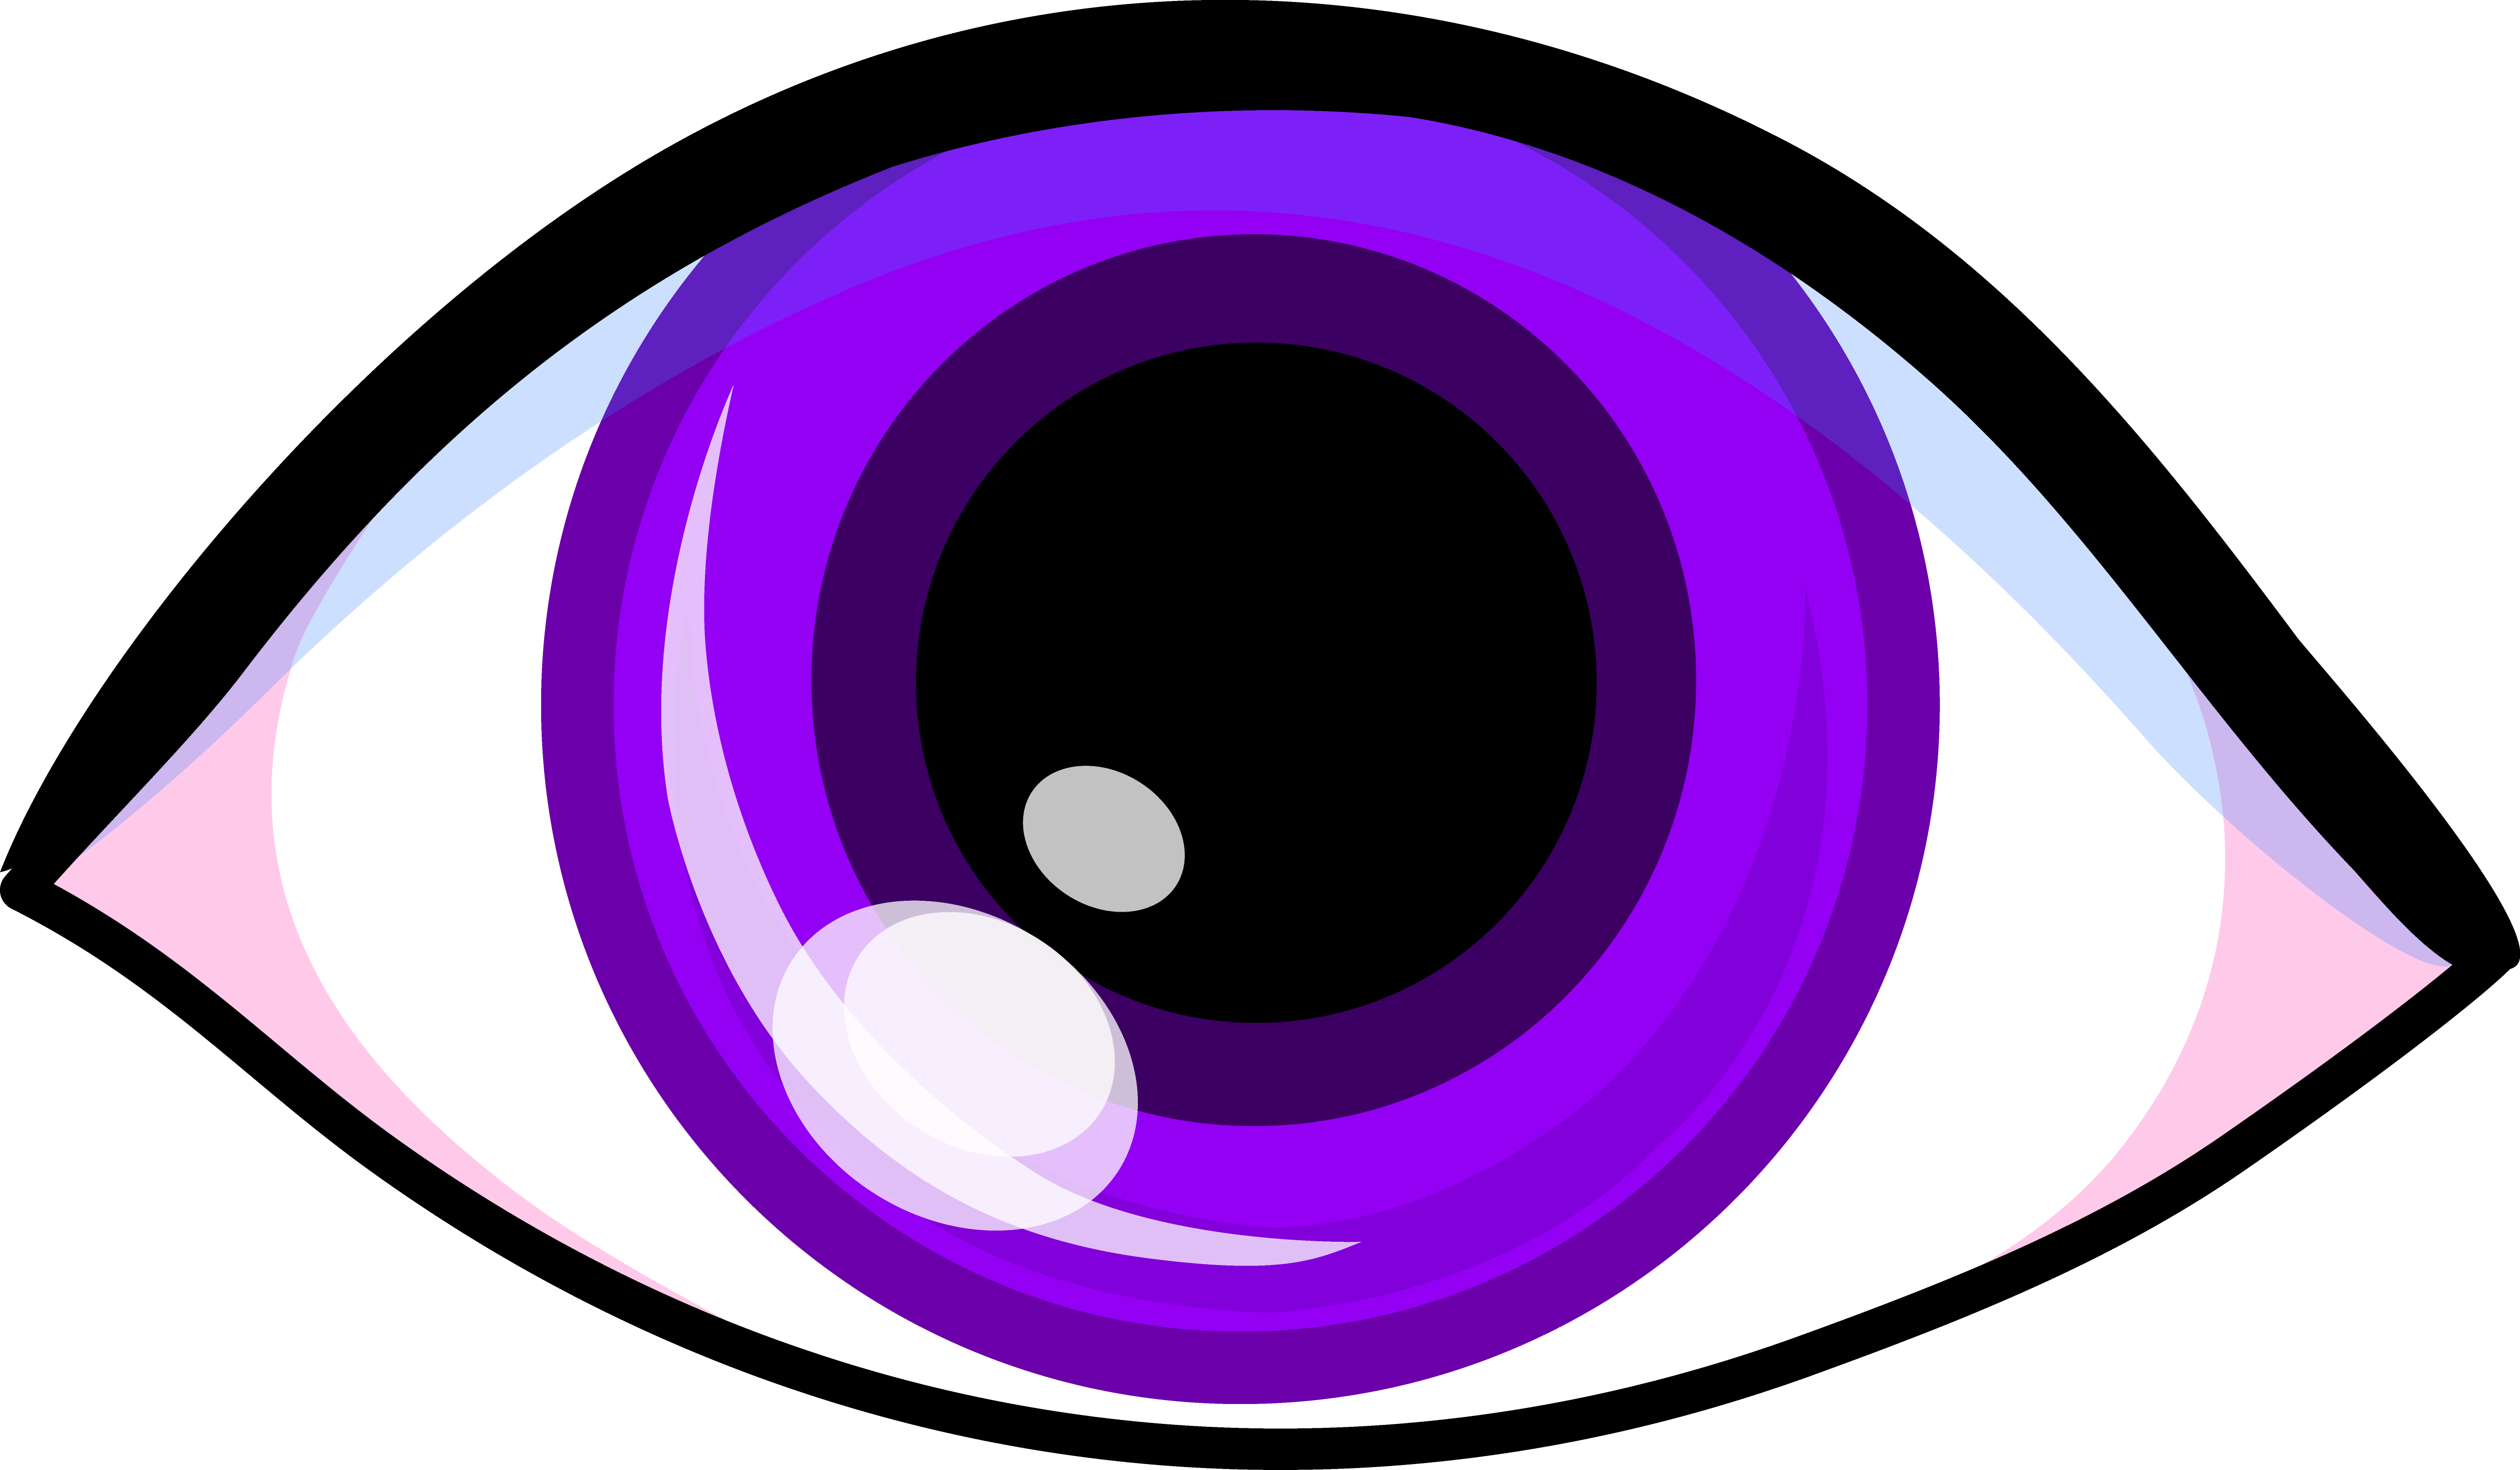 spooky eyes clip art free - photo #15